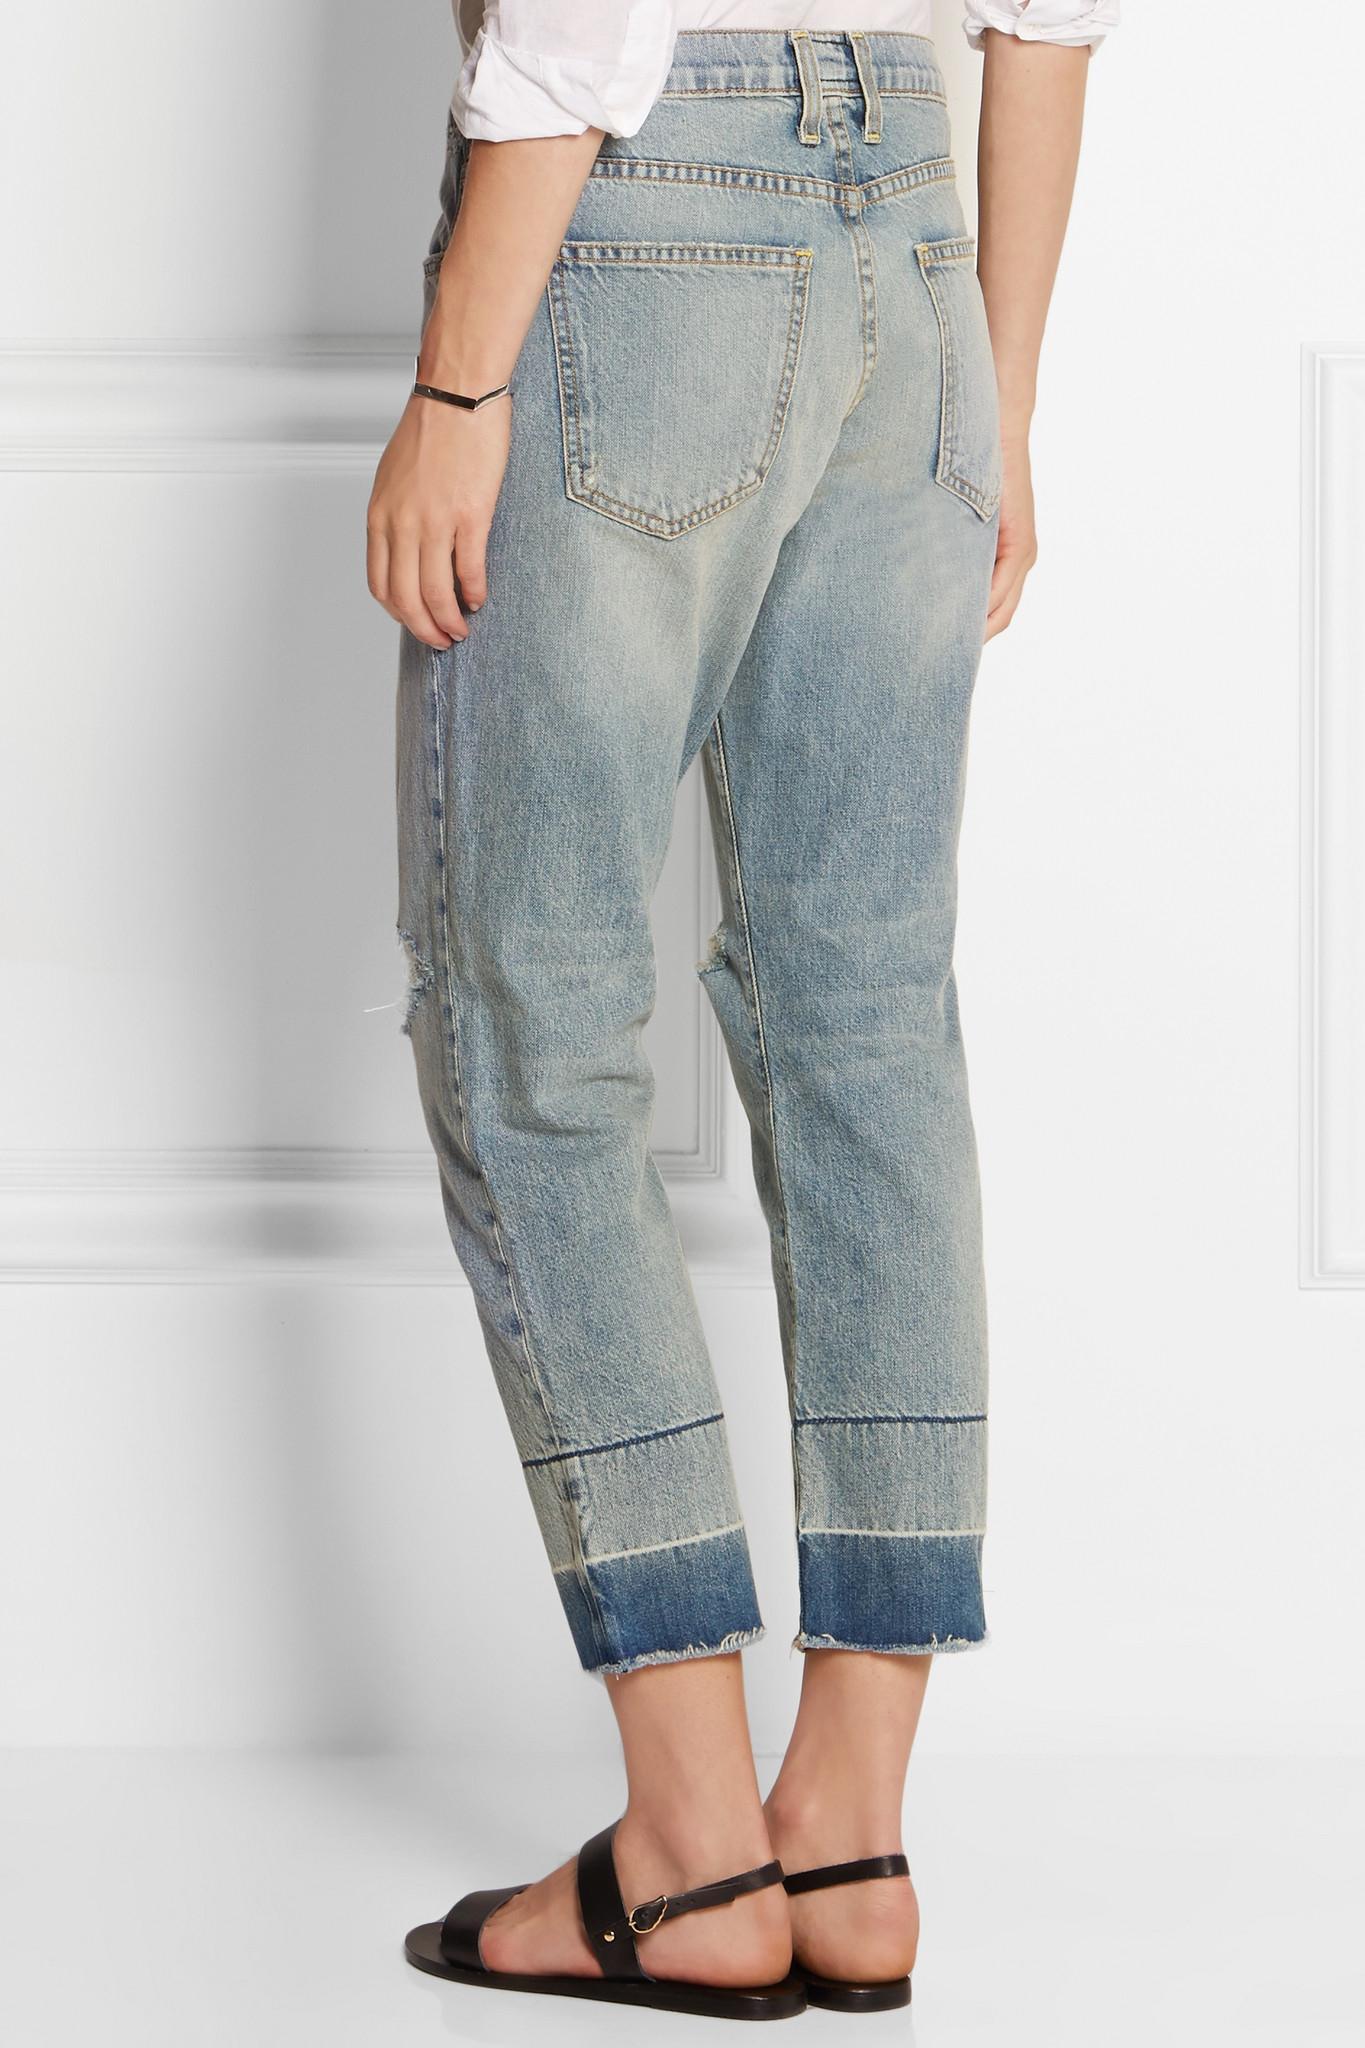 Current/elliott Woman Distressed Boyfriend Jeans Army Green Size 26 Current Elliott Cdqr4vlf